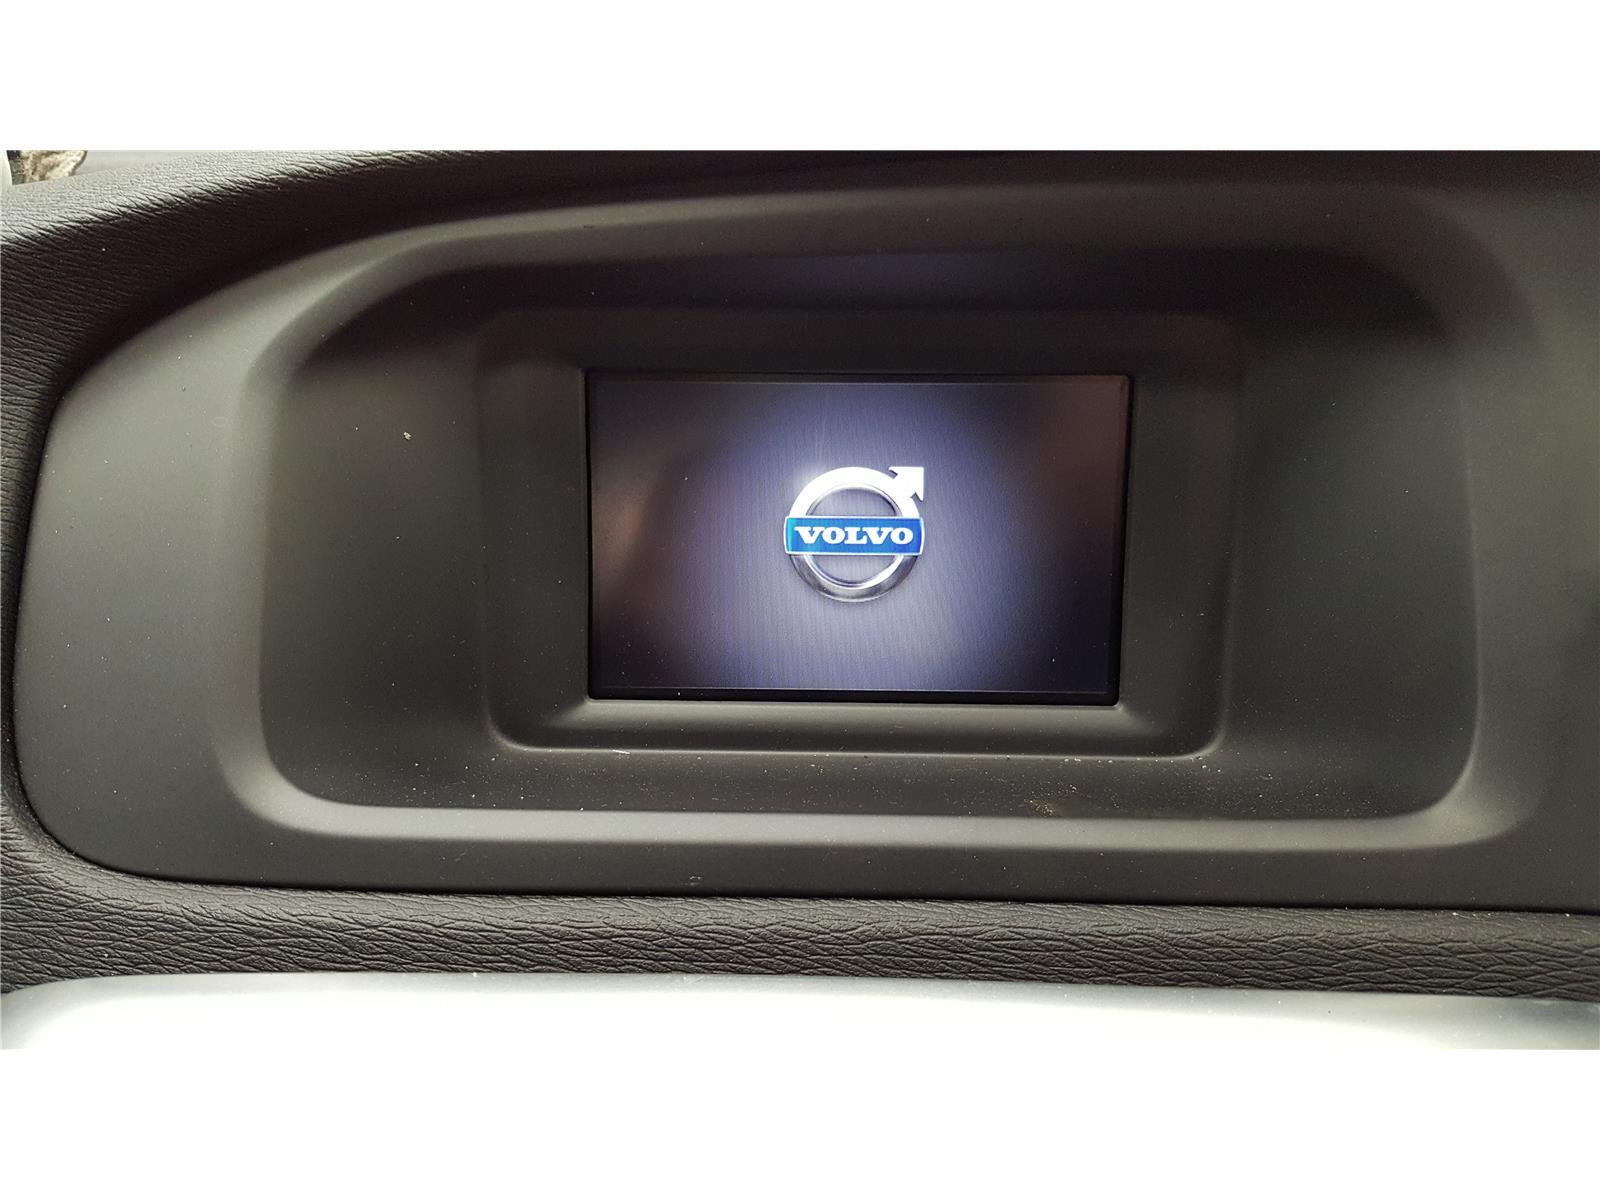 Volvo V40 2012 To 2016 Radio CD Player (Diesel / Manual) for sale